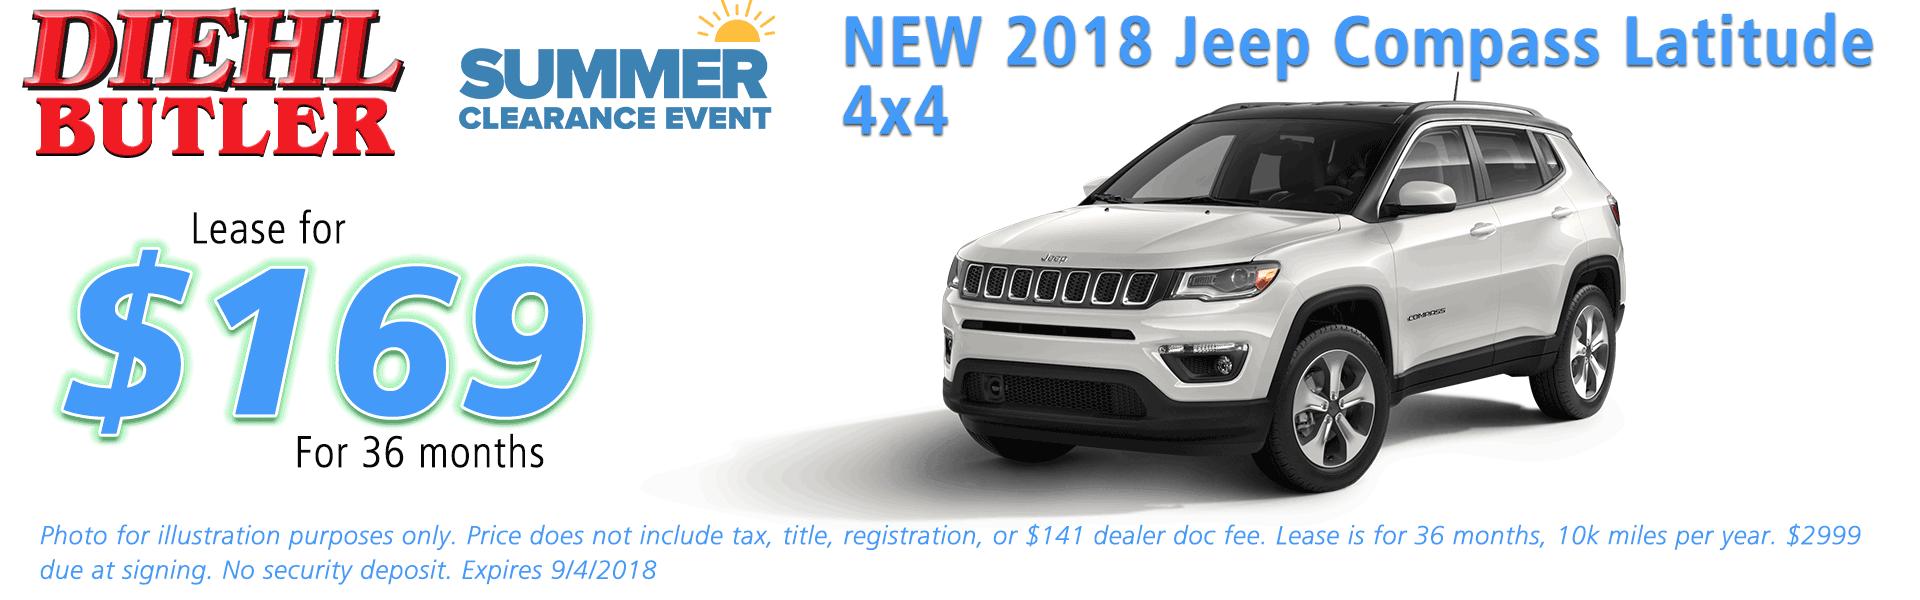 Diehl of Butler, Butler, PA Chrysler Dodge Jeep Ram Toyota Volkswagen service collision sales NEW 2018 JEEP COMPASS LATITUDE 4X4